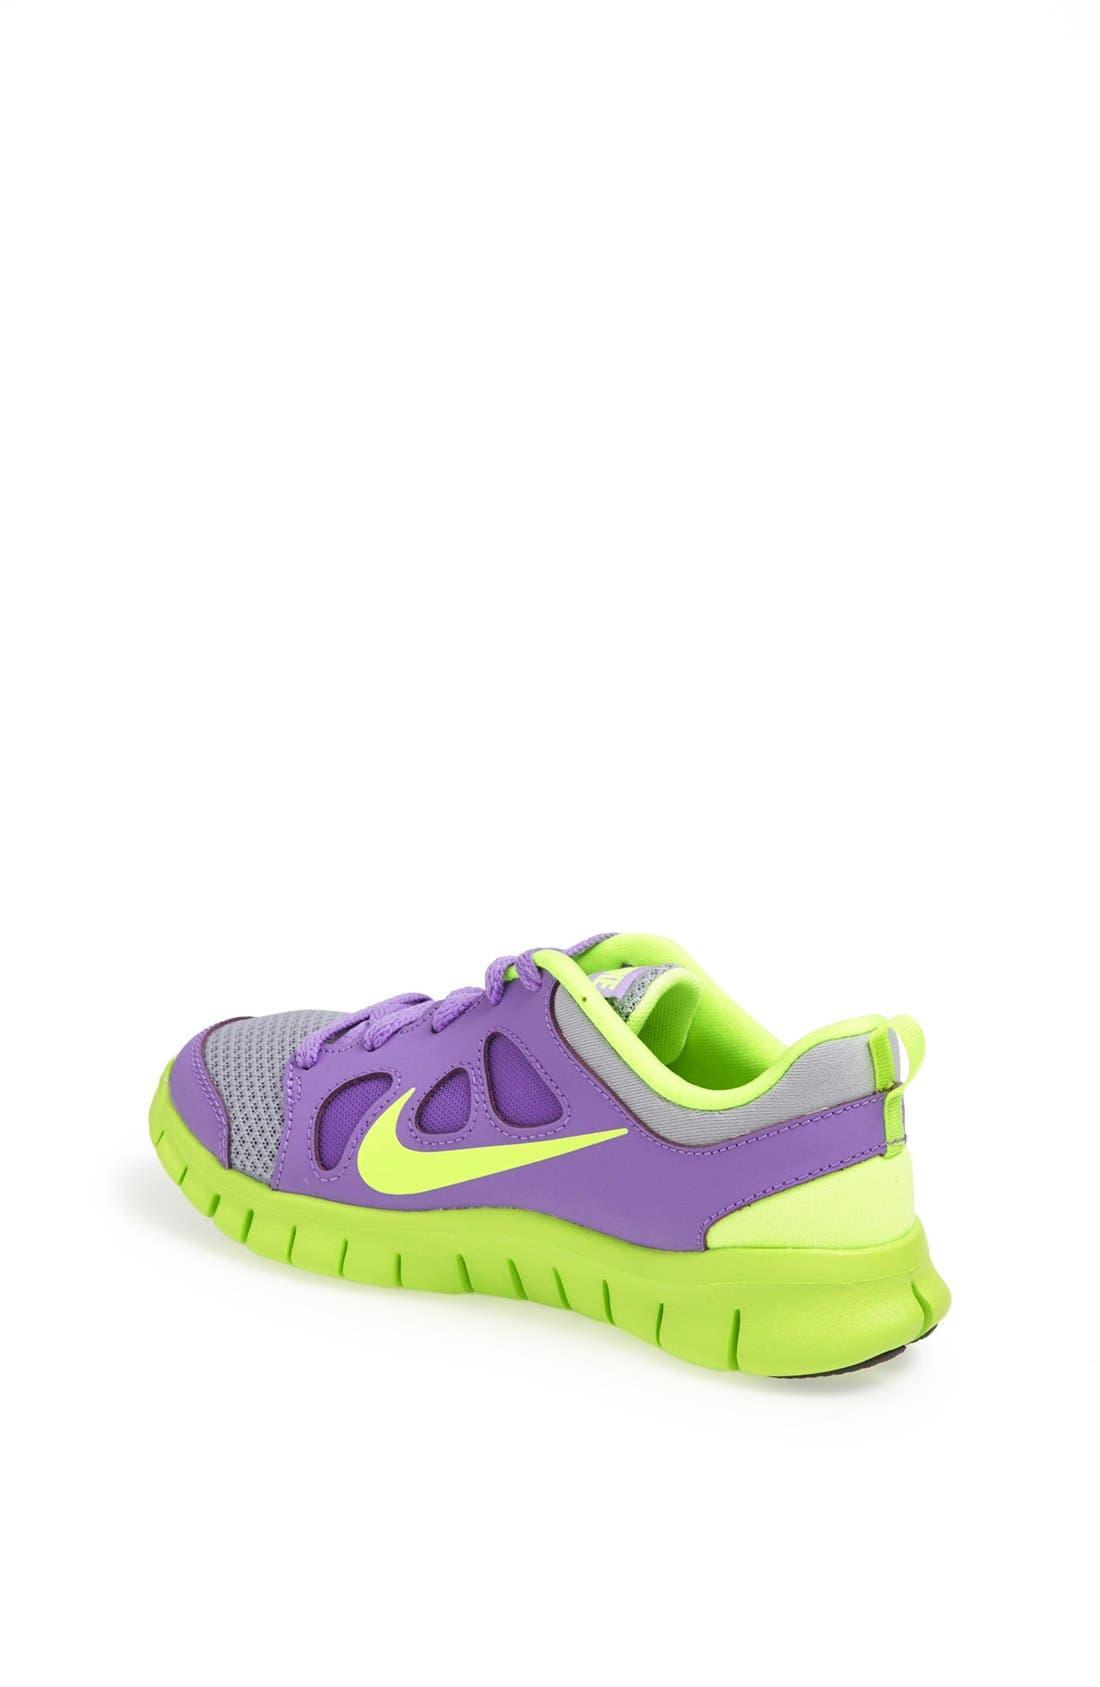 'Free Run 5.0' Running Shoe,                             Alternate thumbnail 2, color,                             Atomic Violet/ Volt/ White